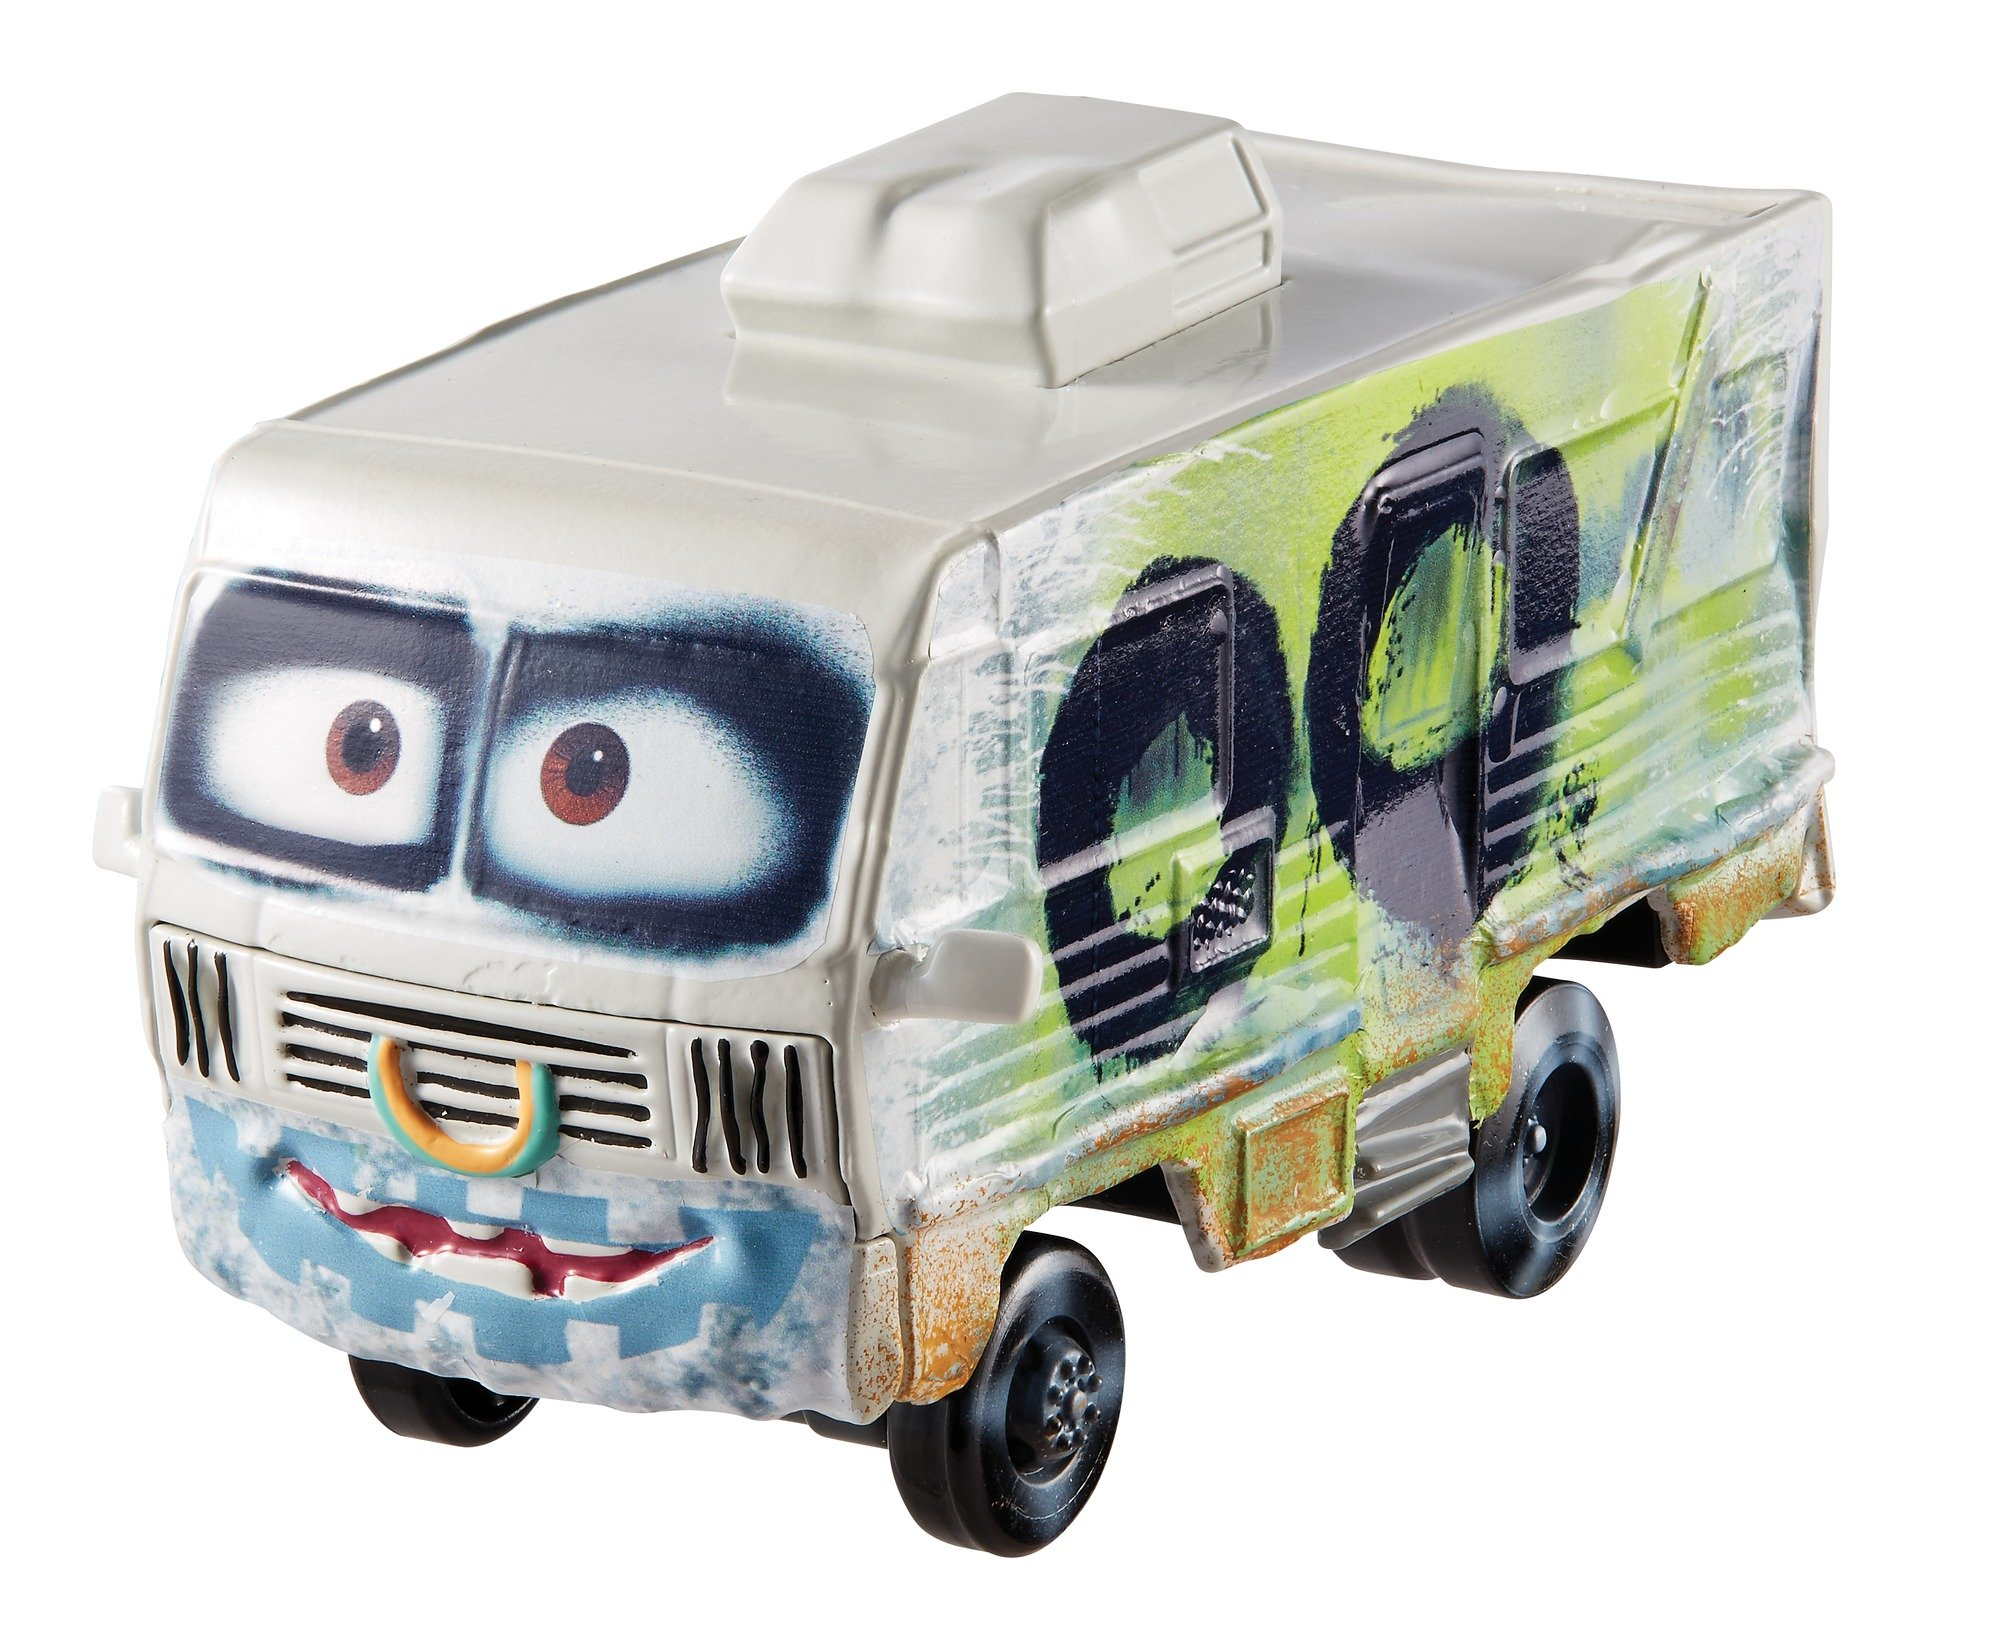 Disney Pixar Cars 3 Deluxe Arvy Vehicle, 1:55 Scale